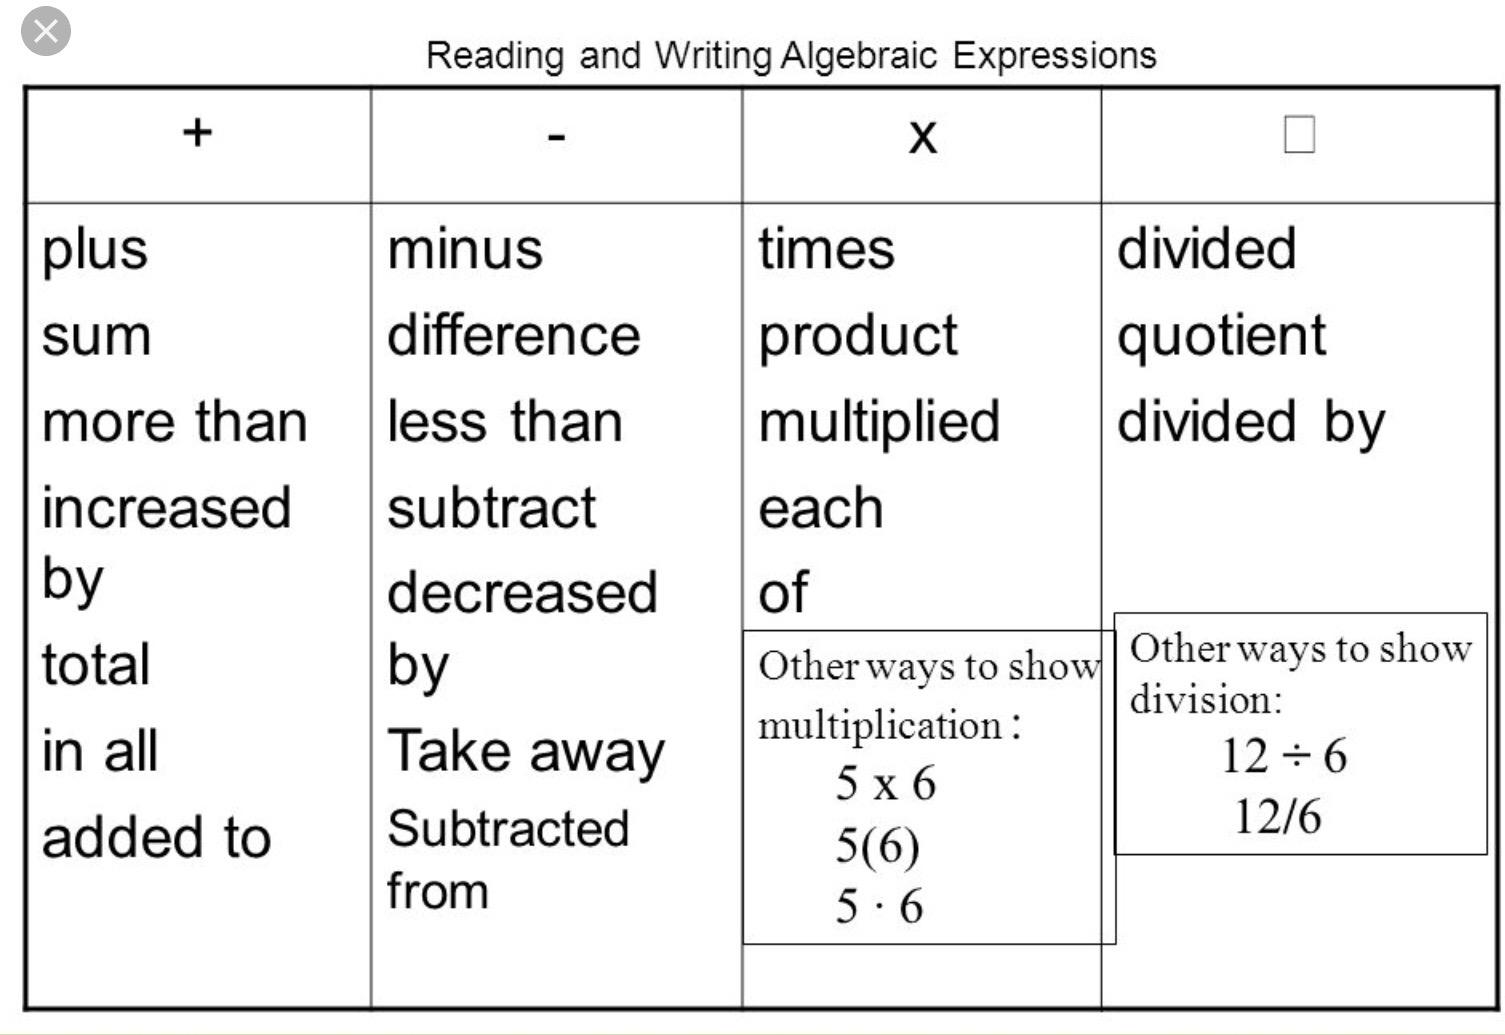 write an algebraic expression Writing algebraic expressions for inverse trigonometric functions - продолжительность: 5:40 eric hutchinson 2 576 просмотров write an algebraic expression for cos(sin^-1 x), cosine of inverse x - продолжительность: 3:28 blackpenredpen 21 204 просмотра.